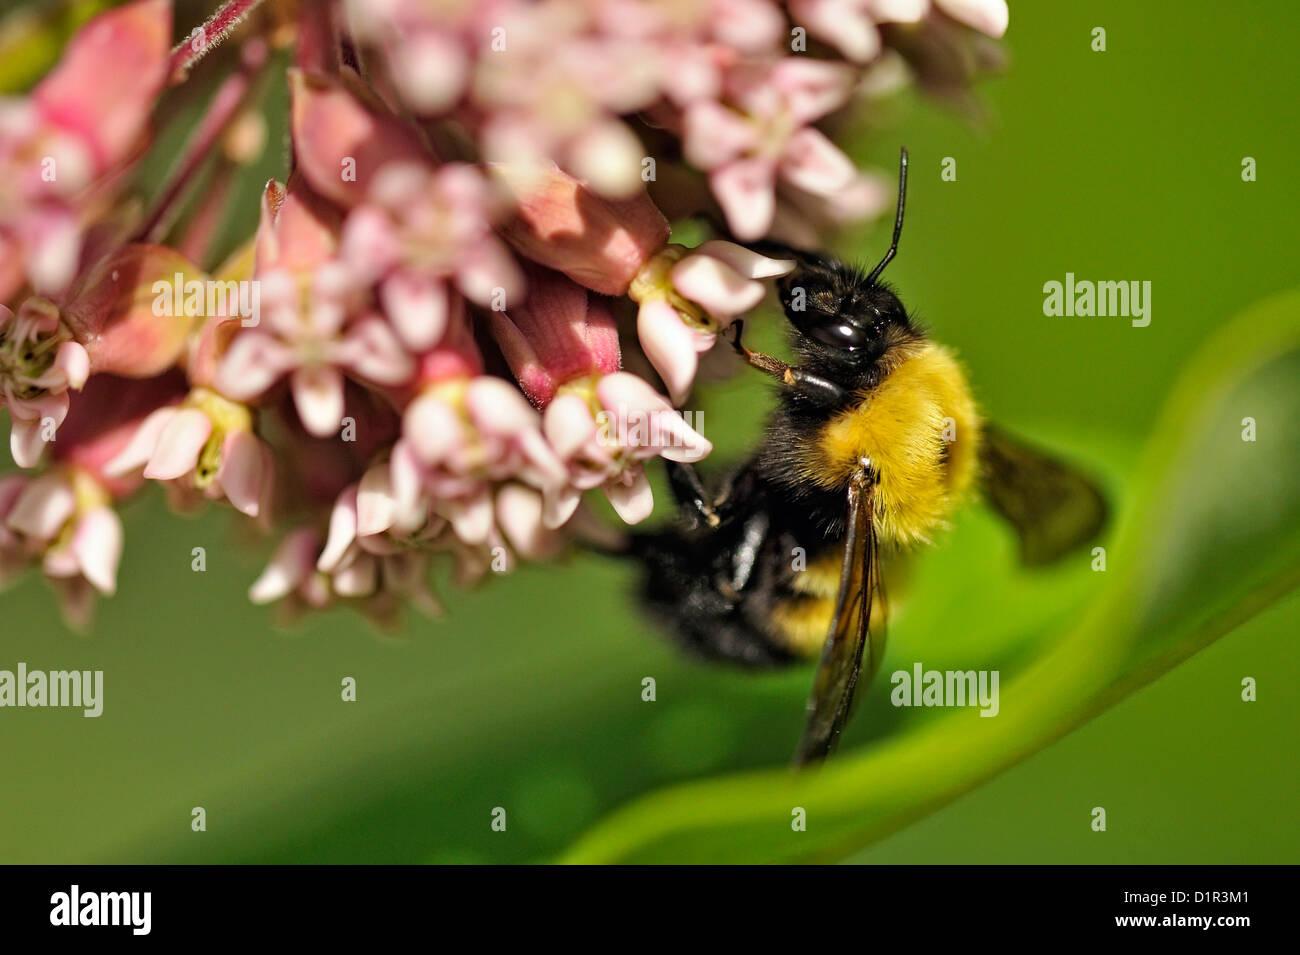 Bumblebeee (Bombus sp.) nectaring on common milkweed (Asclepias syriaca), Greater Sudbury , Ontario, Canada - Stock Image